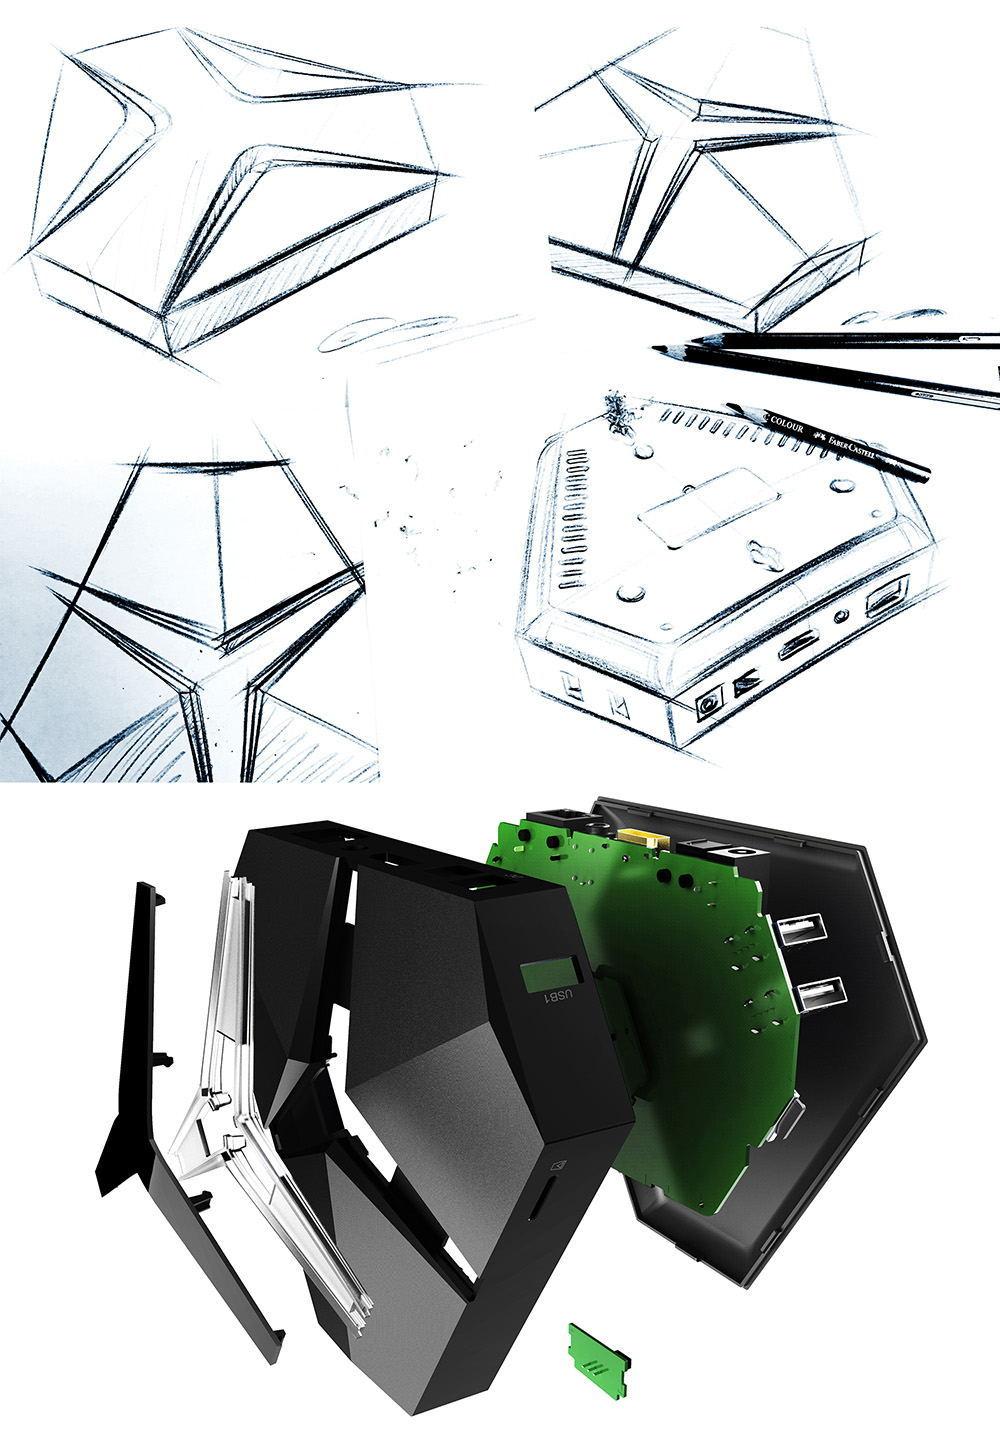 new magicsee iron+ tv box